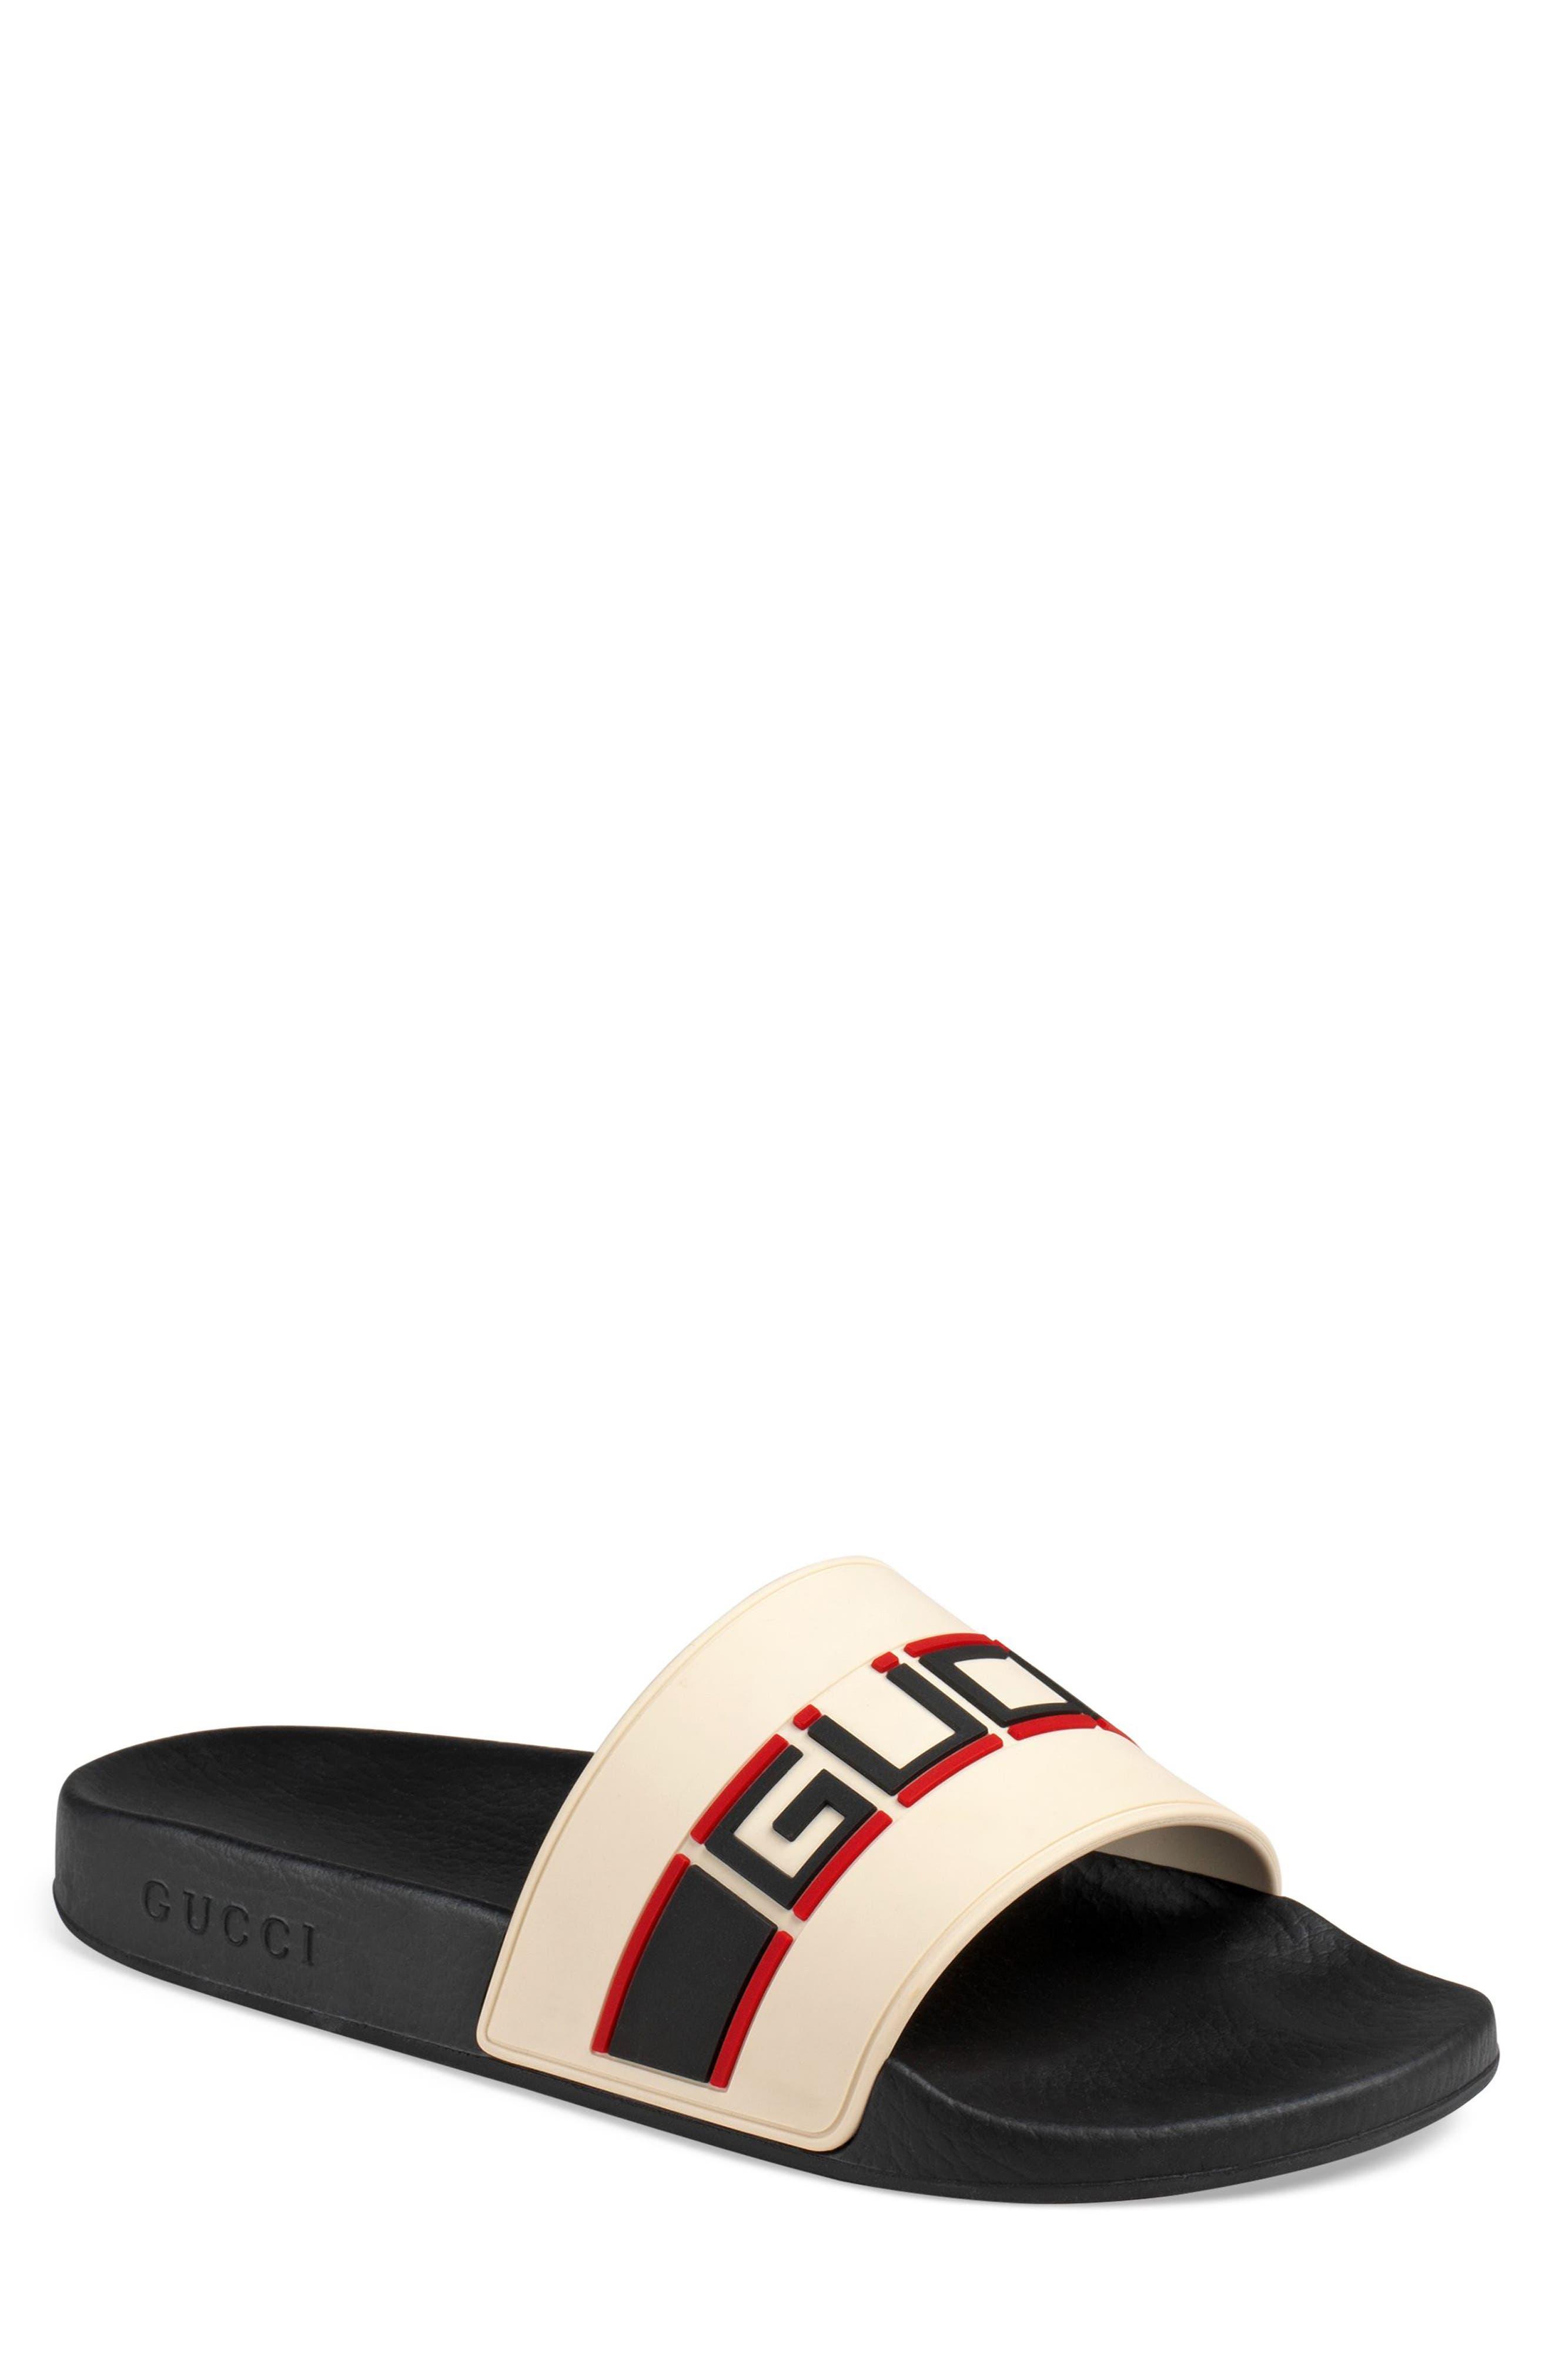 Pursuit Stripe Slide Sandal,                             Main thumbnail 1, color,                             WHITE/ POPPY/ NERO